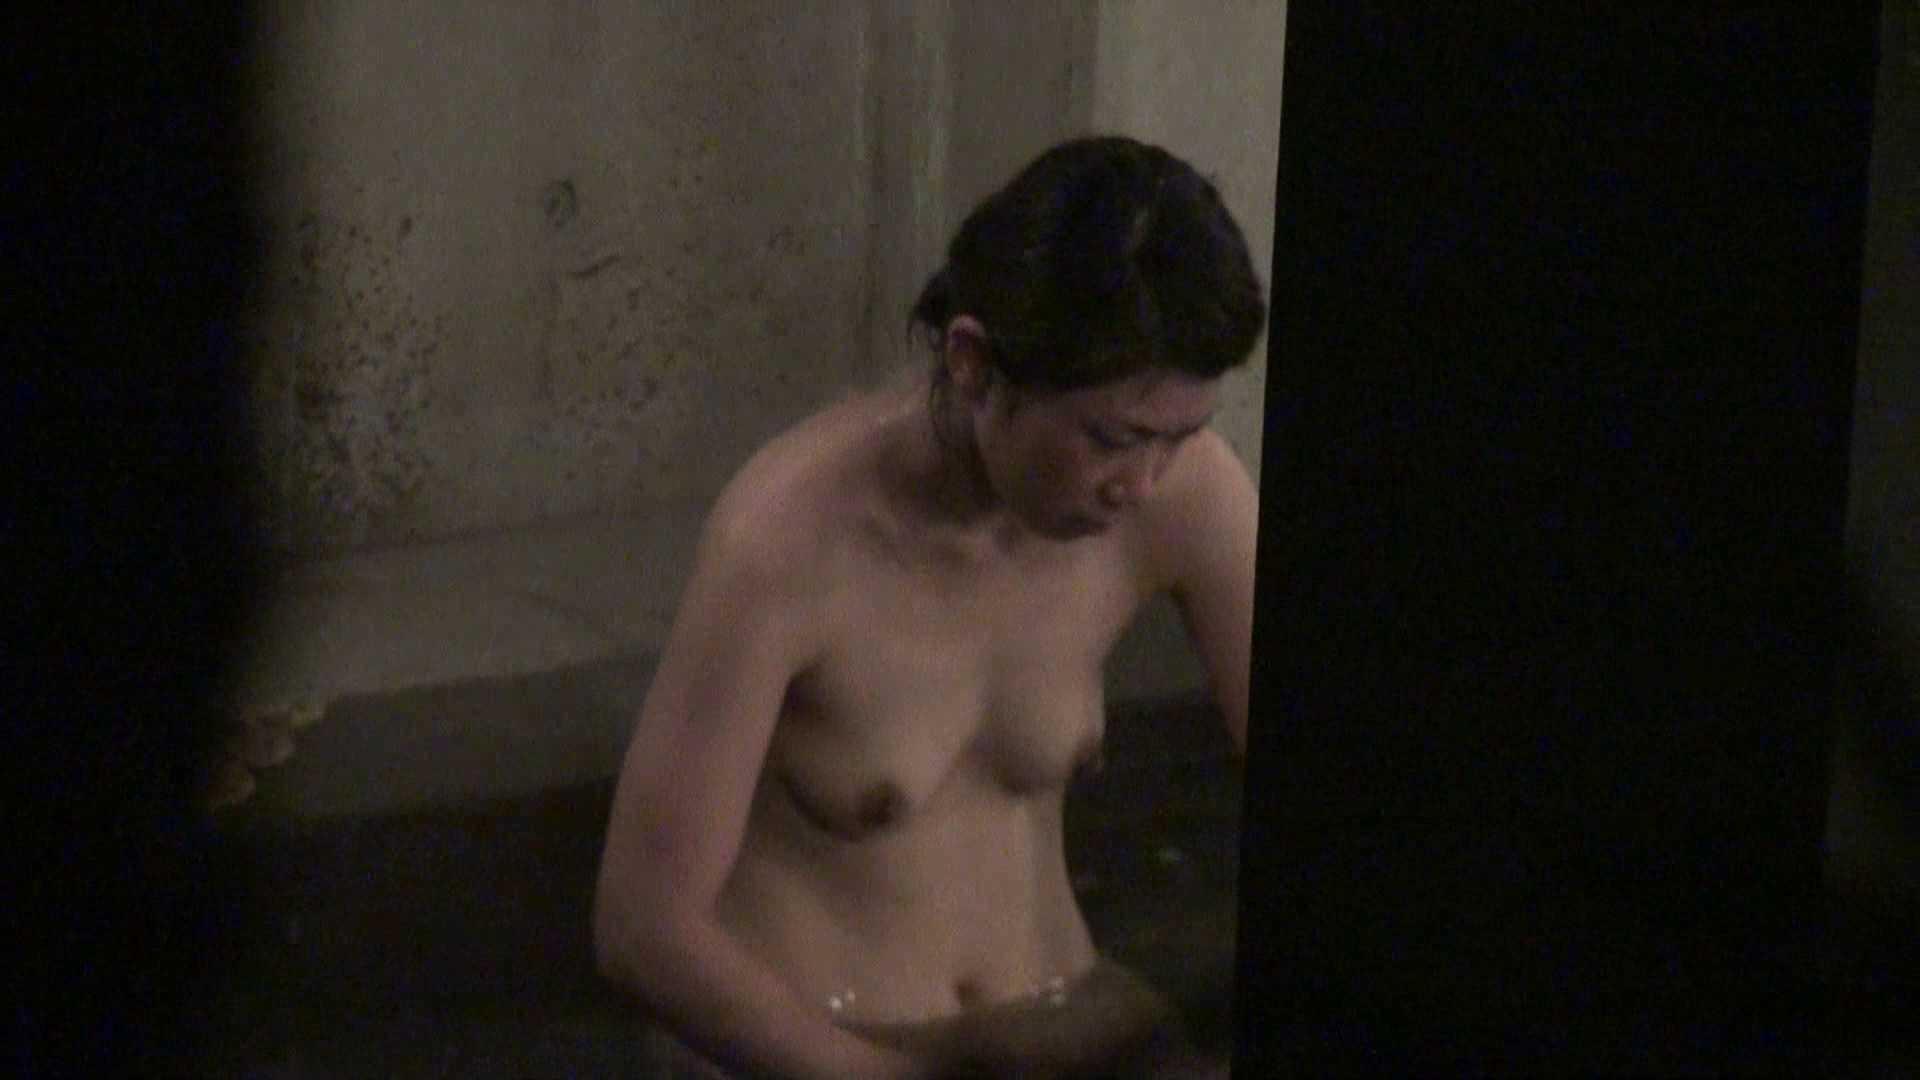 Aquaな露天風呂Vol.426 美しいOLの裸体 AV無料動画キャプチャ 70pic 62